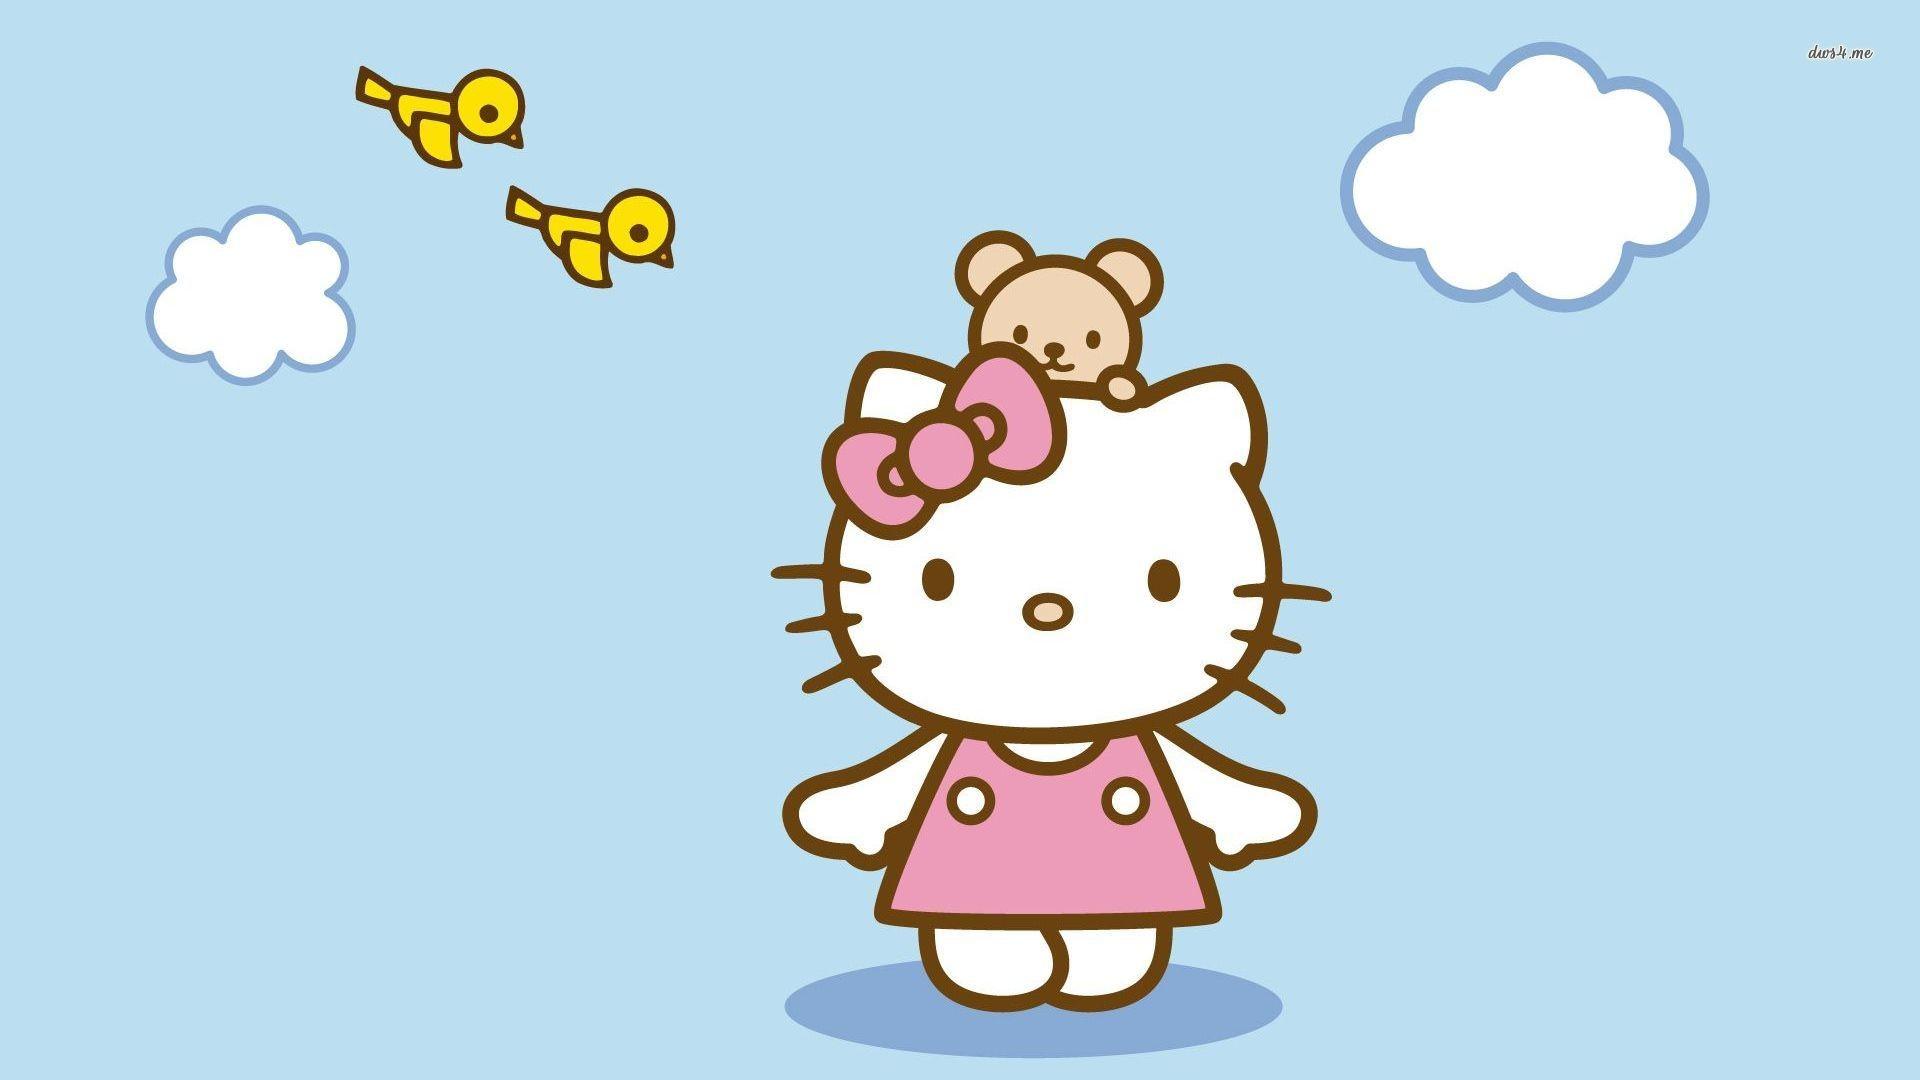 Hd Hello Kitty Wallpapers